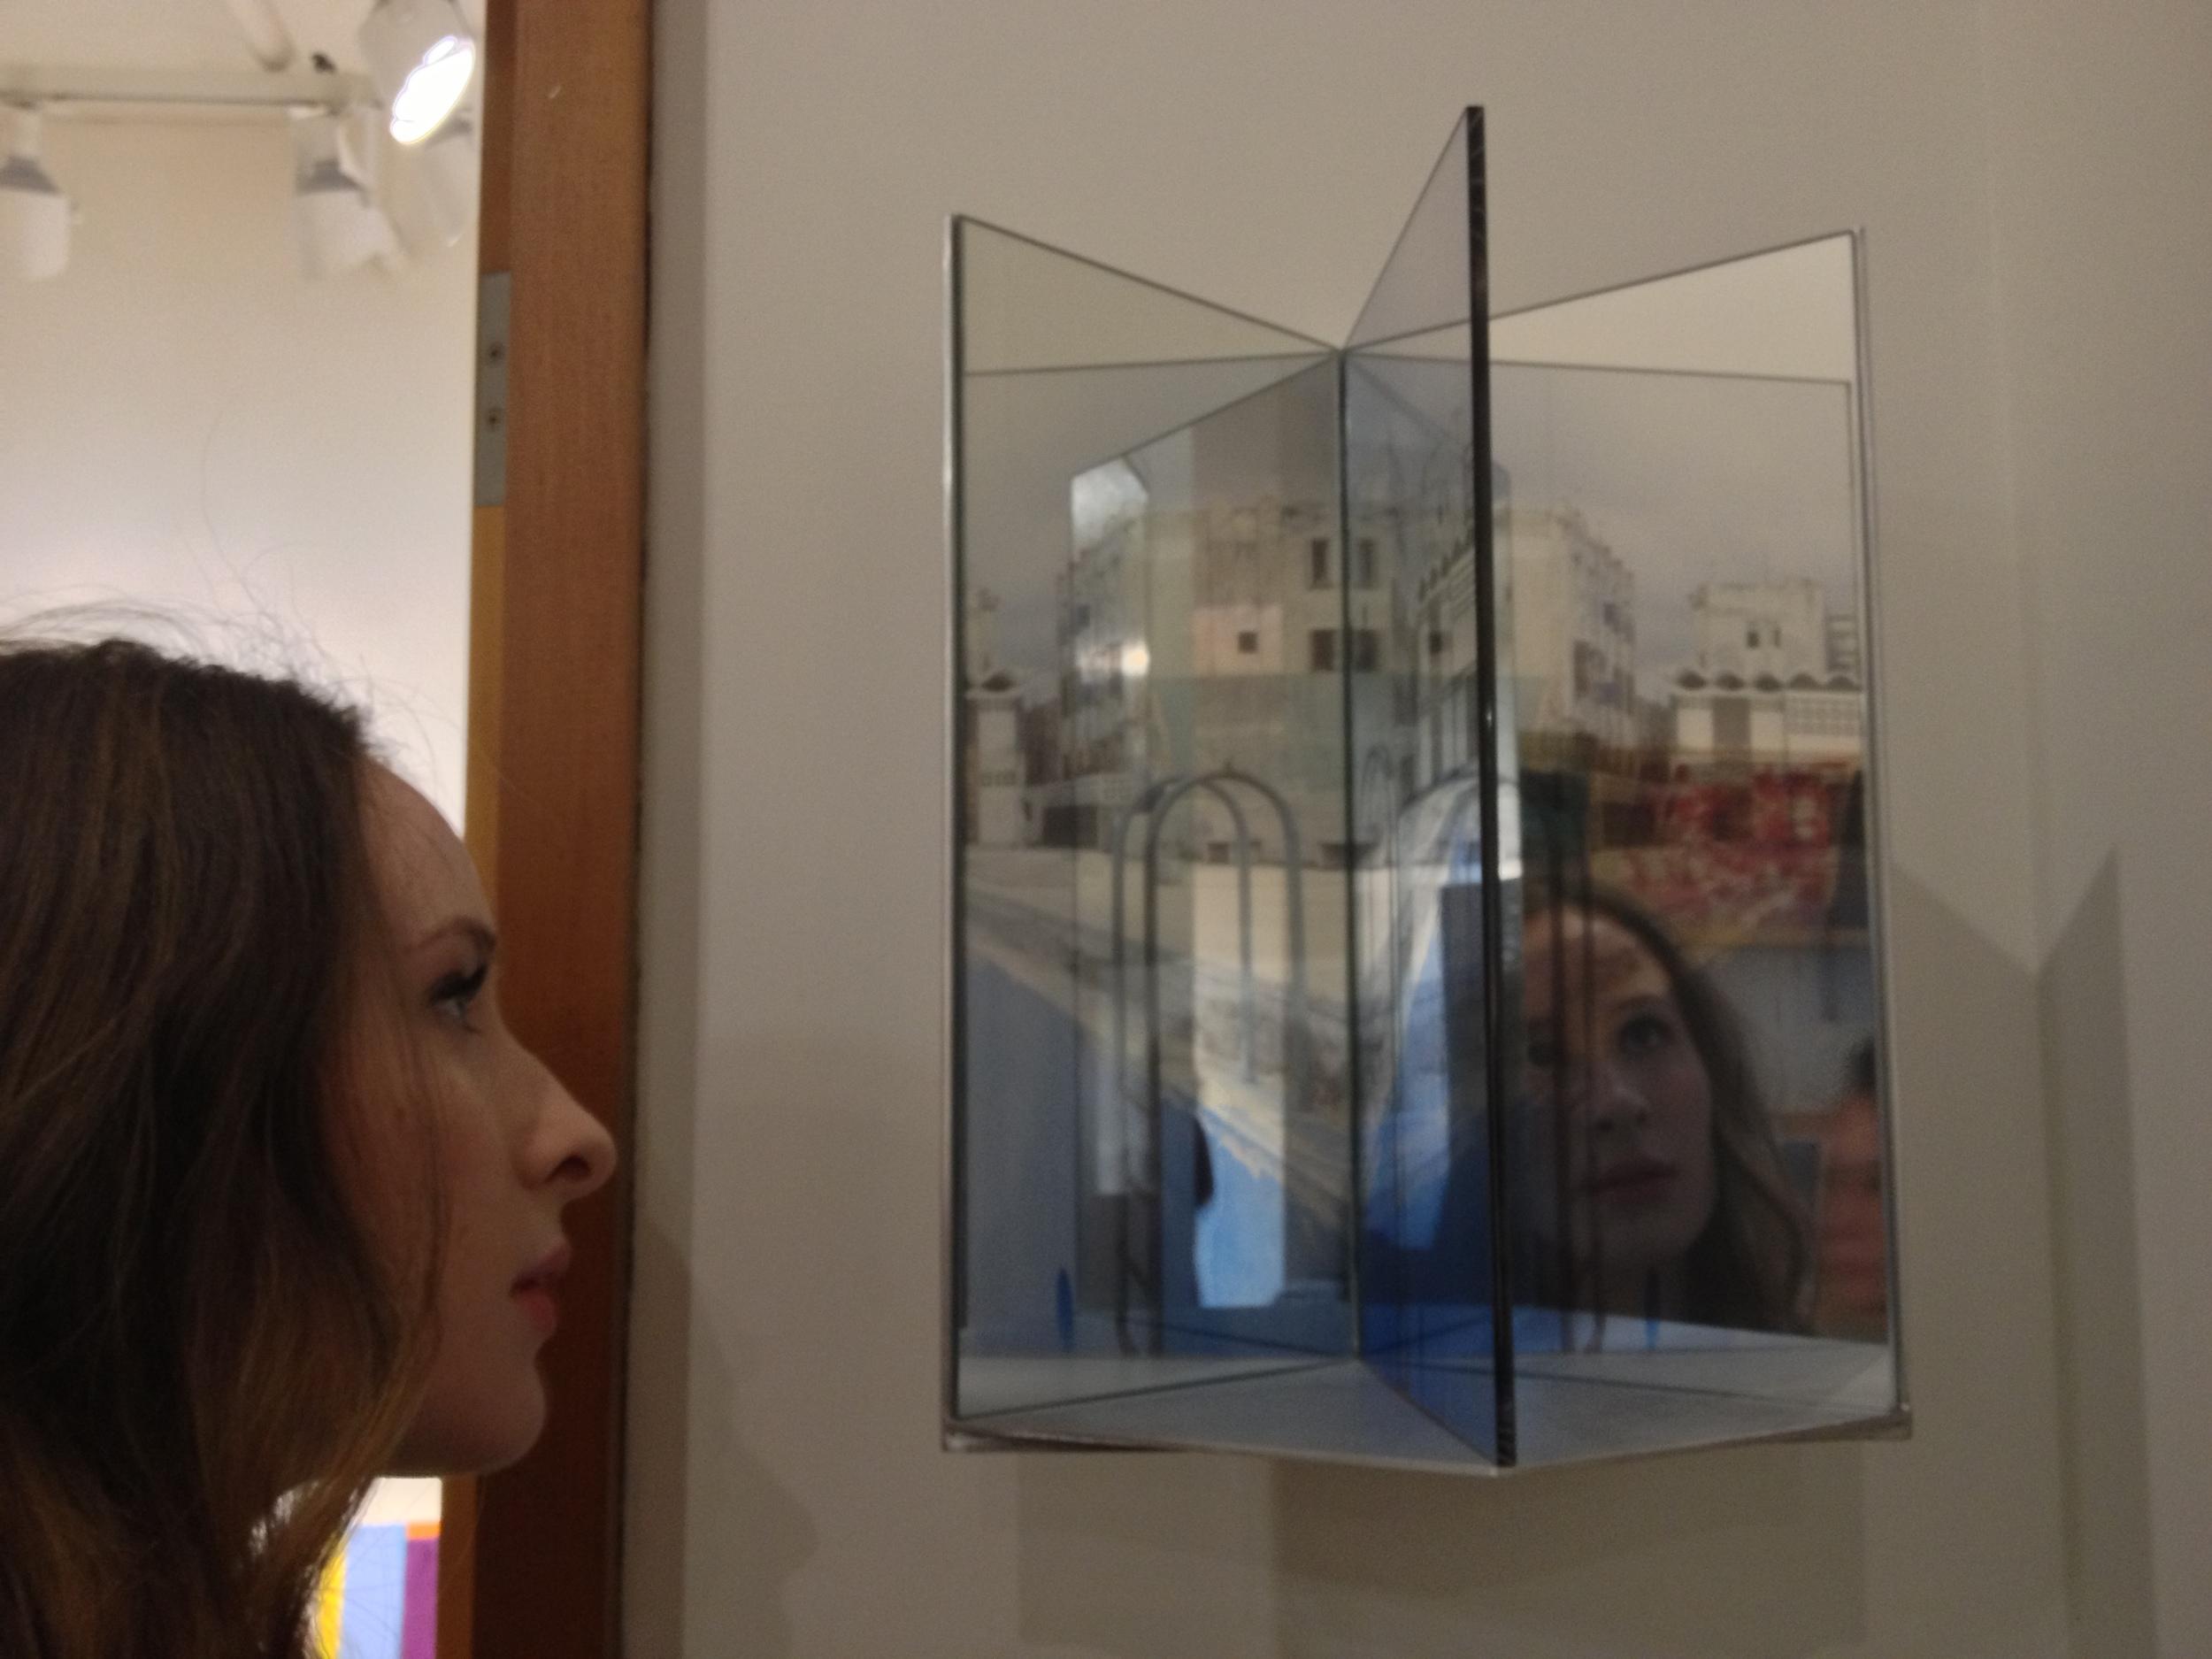 Susan Leopold artwork reflecting back image of viewer